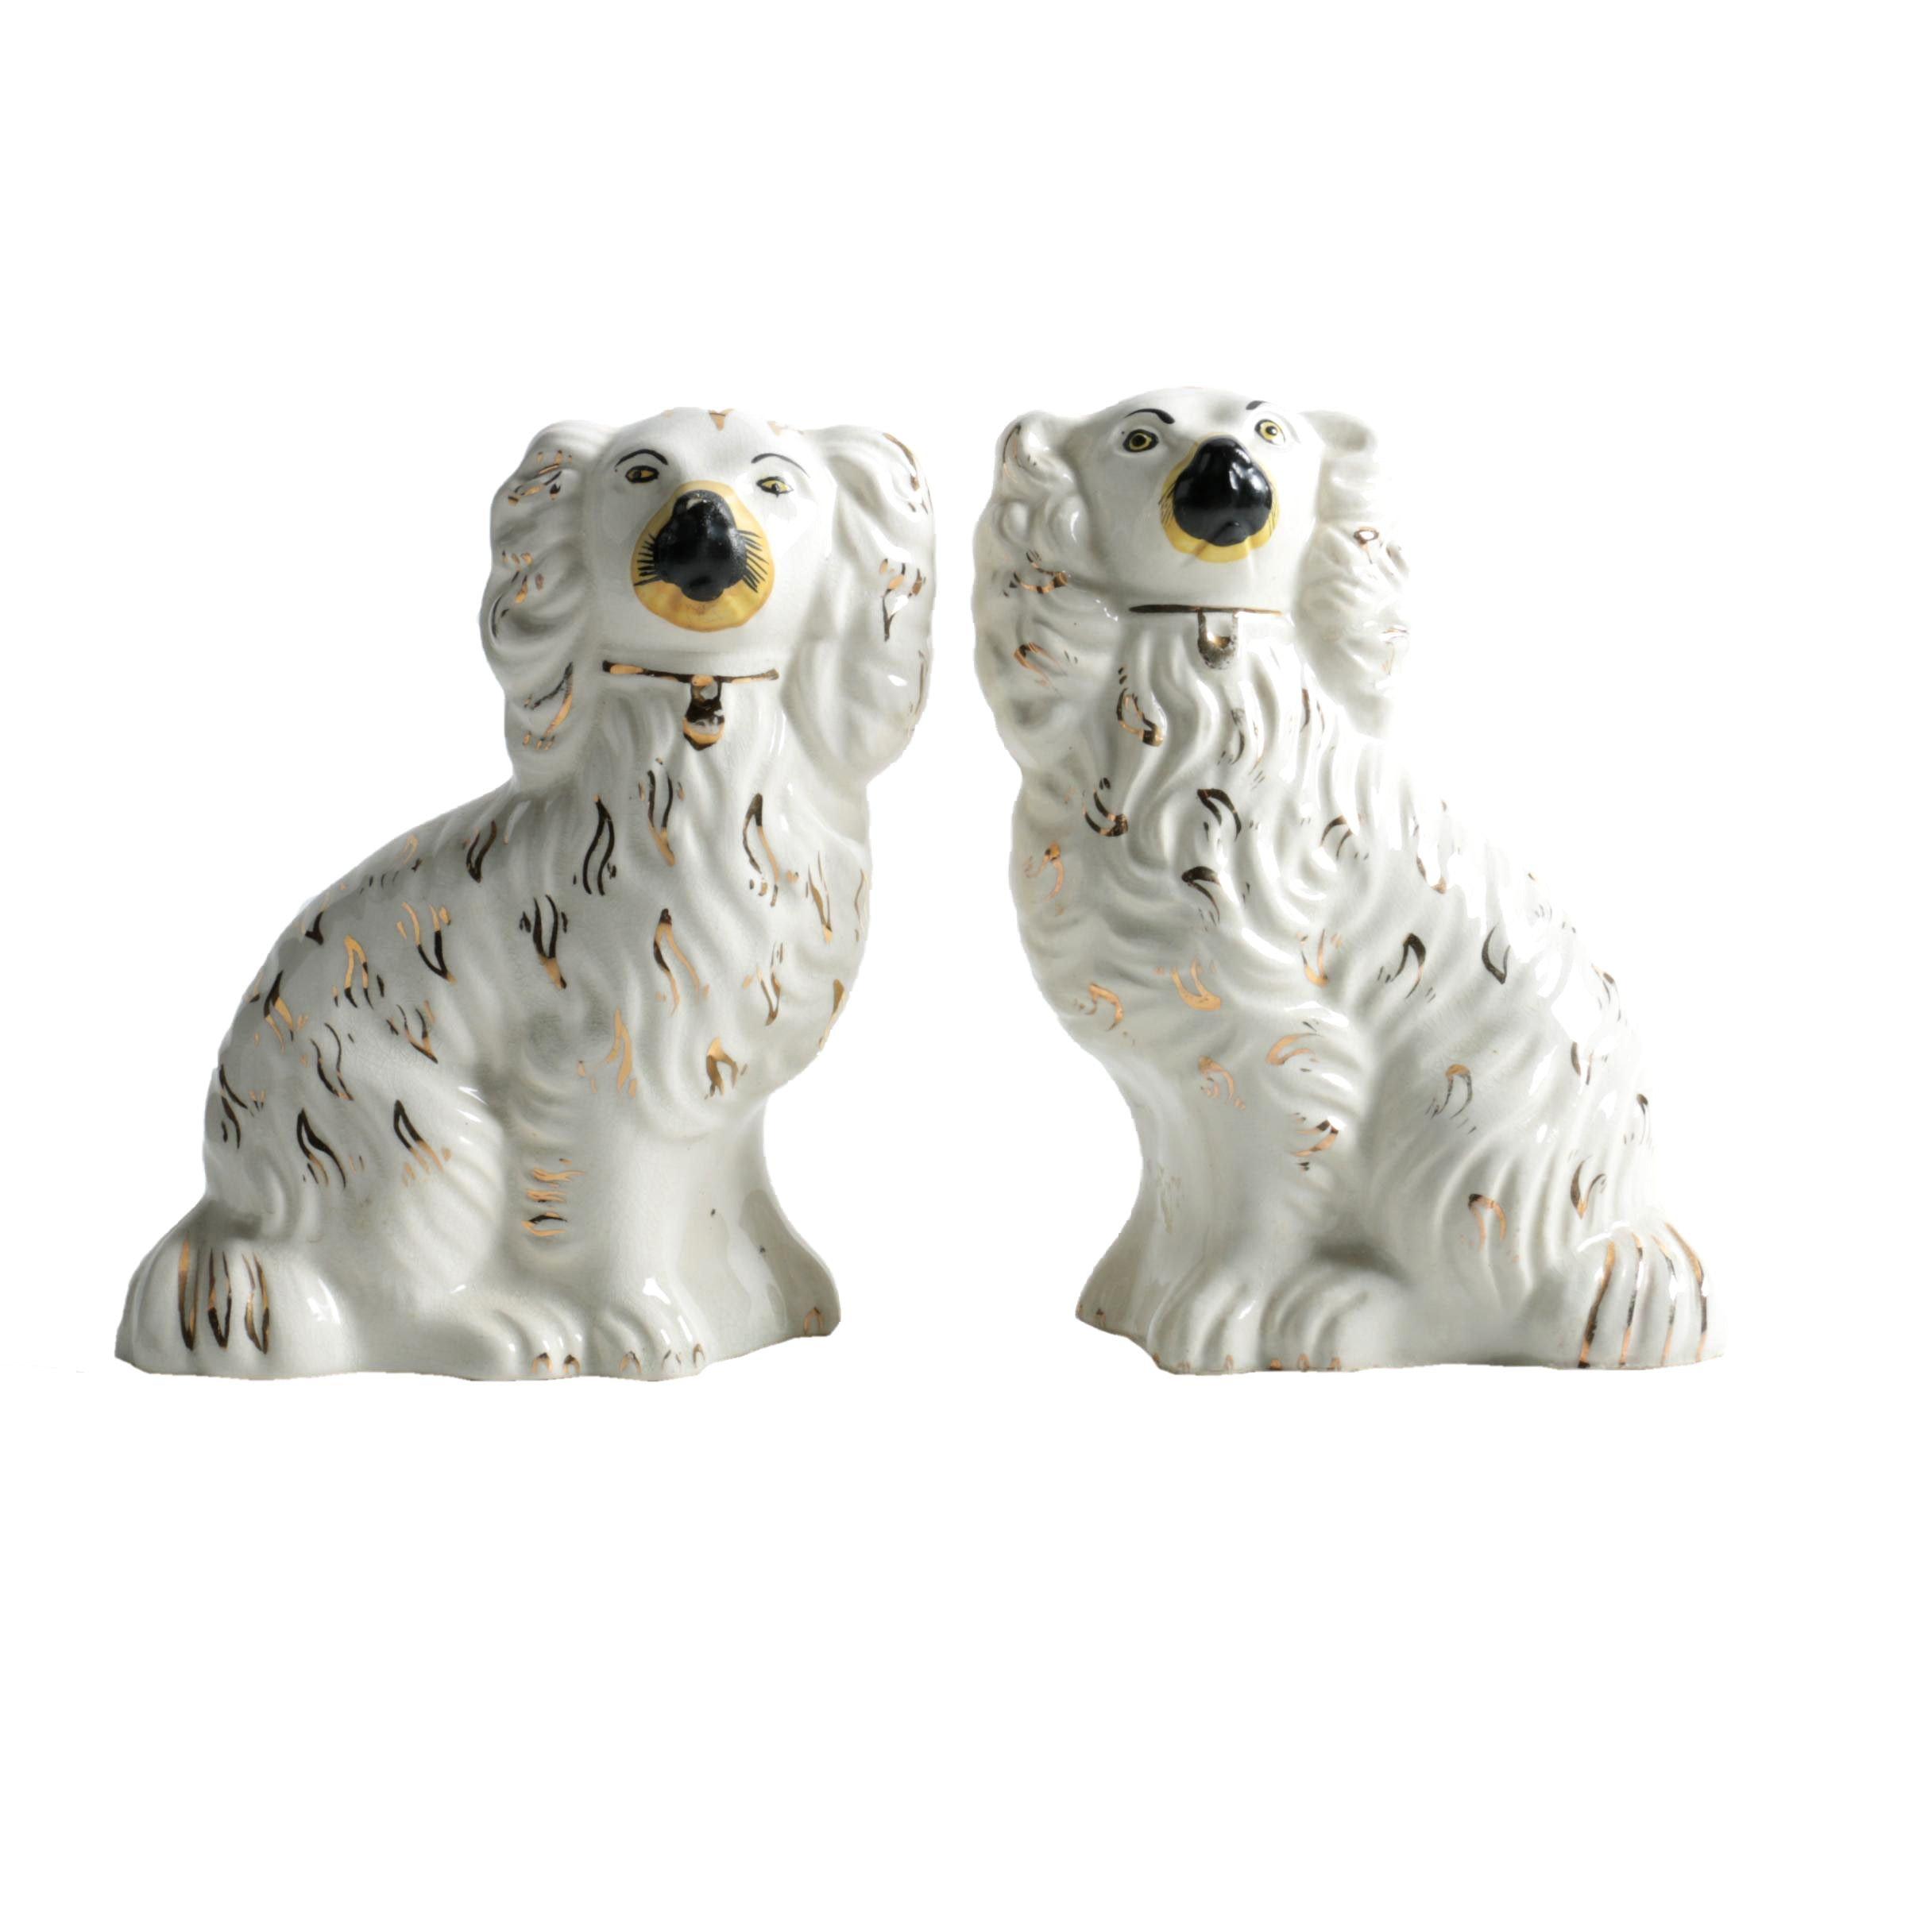 Staffordshire Ceramic Dog Figurines